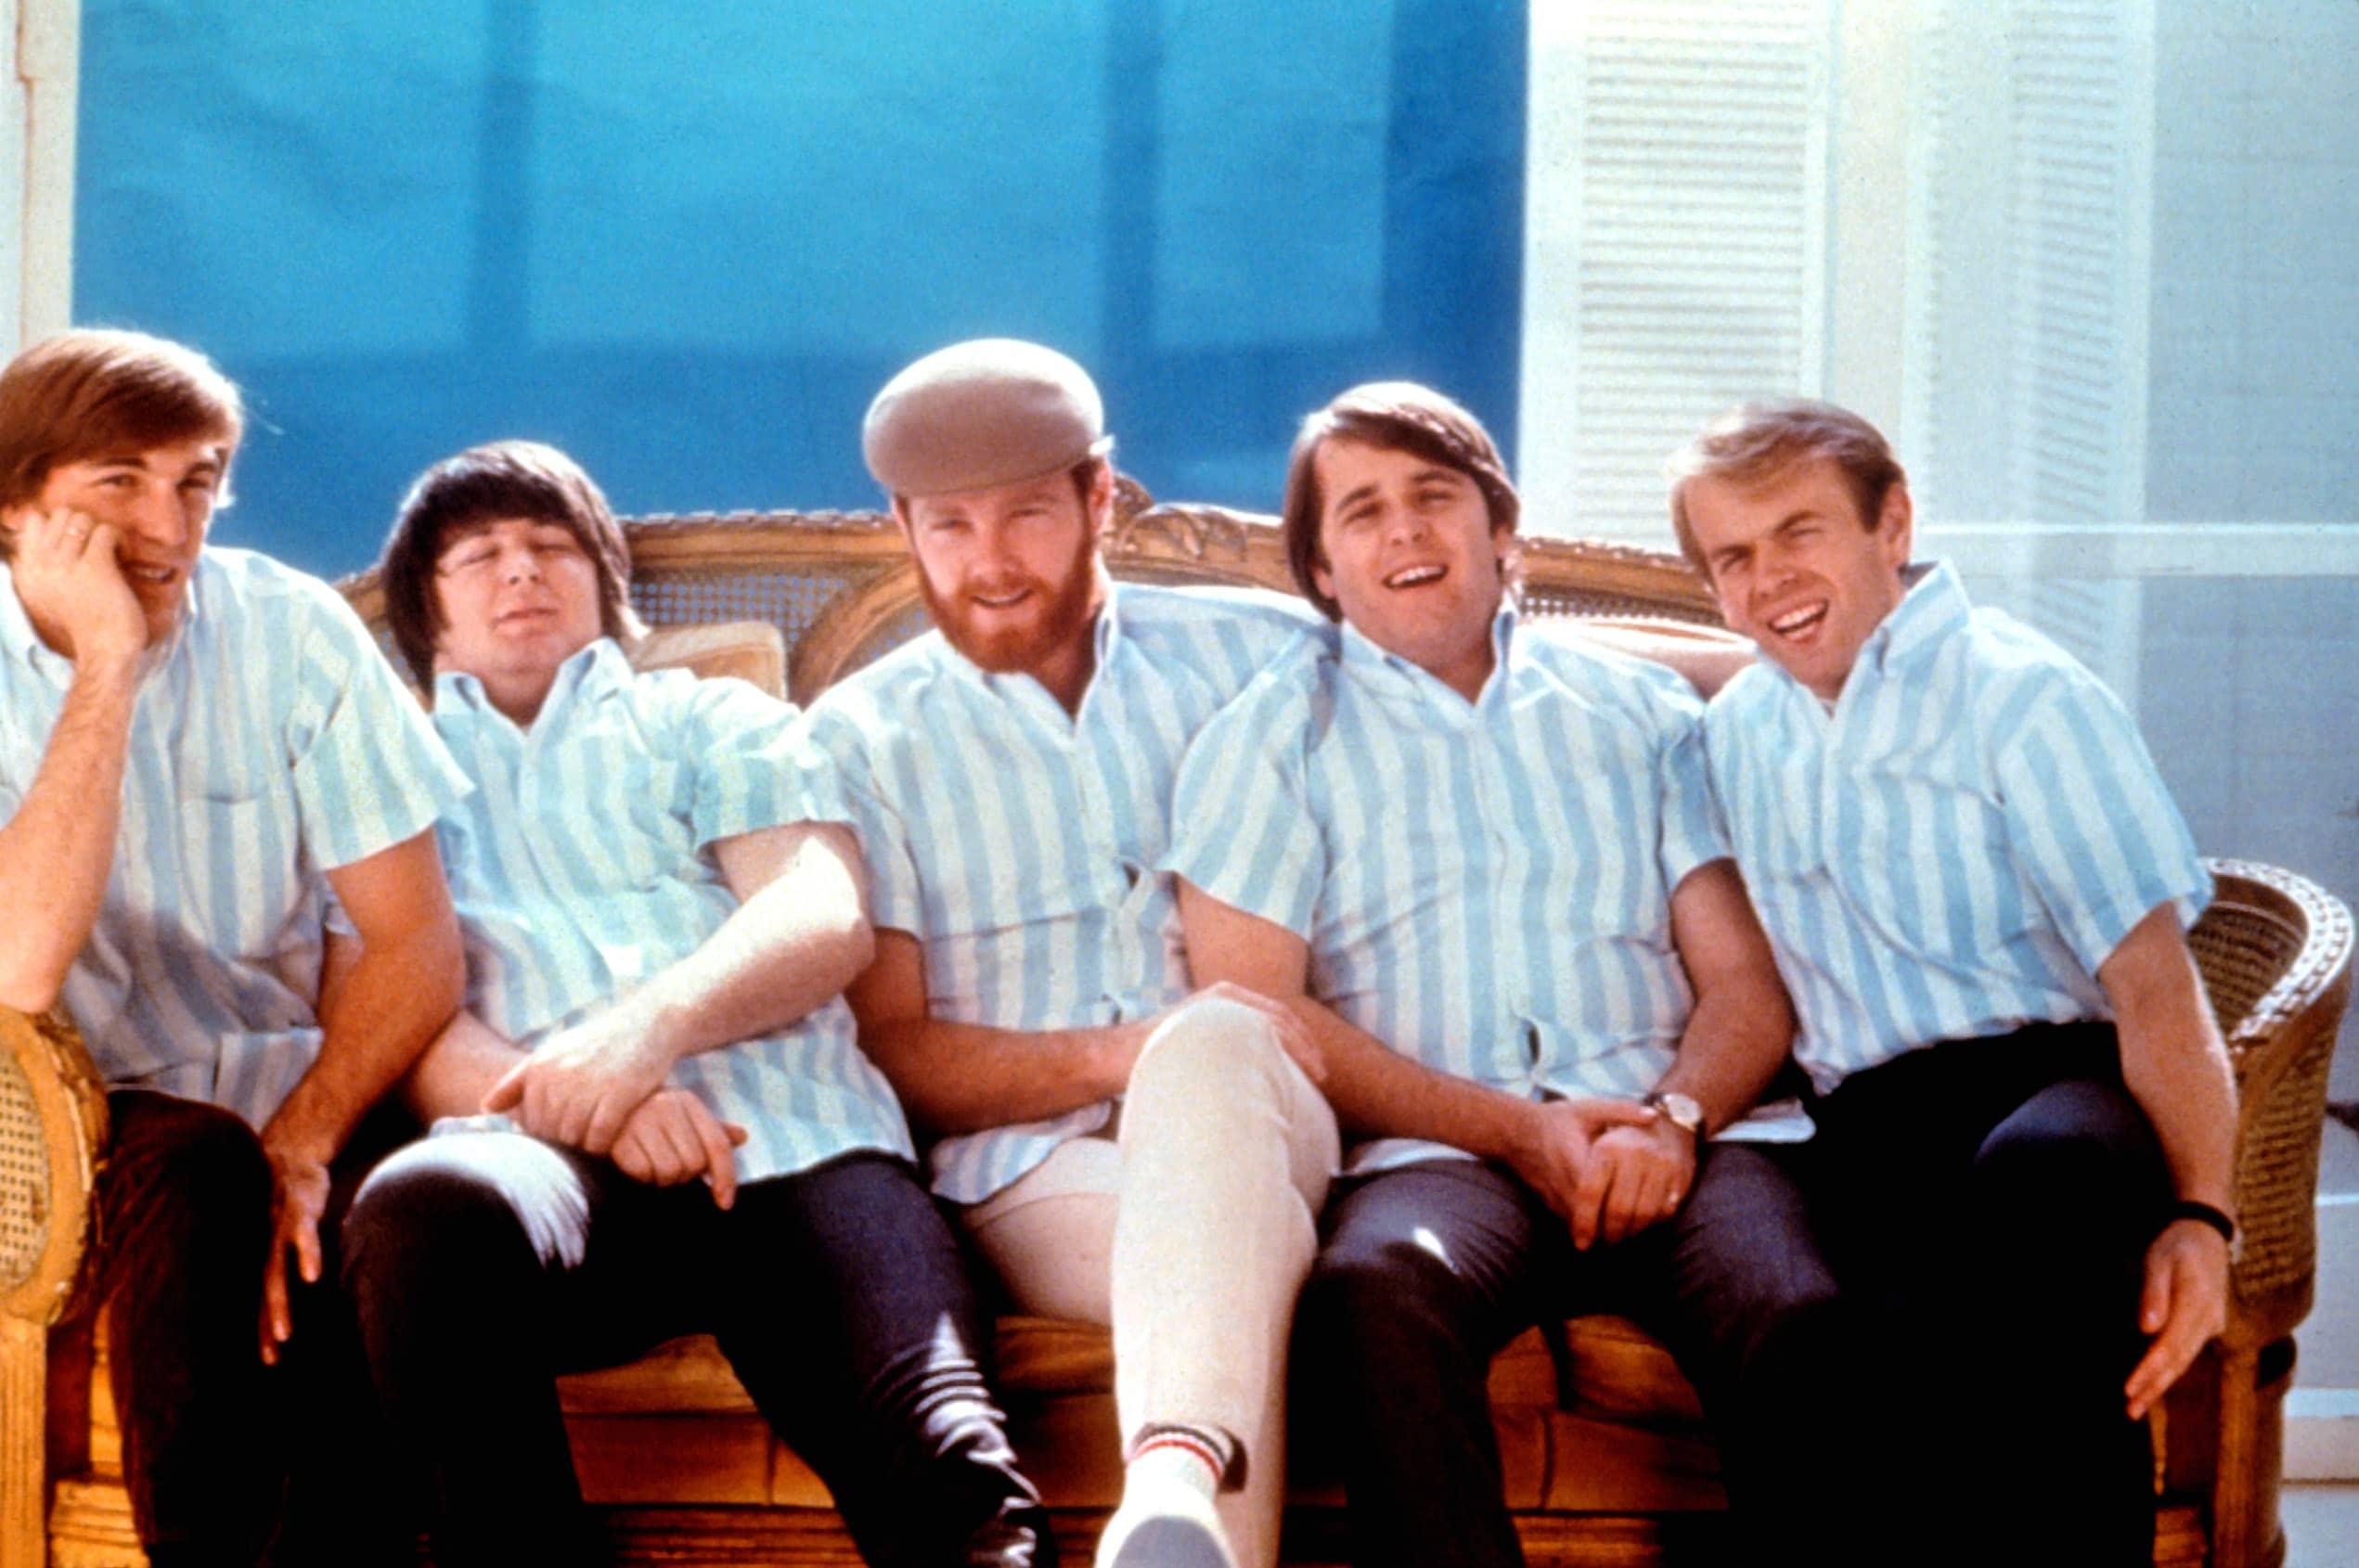 BEACH BOYS, Dennis Wilson, Brian Wilson, Mike Love, Carl Wilson, Al Jardine, mid-1960s